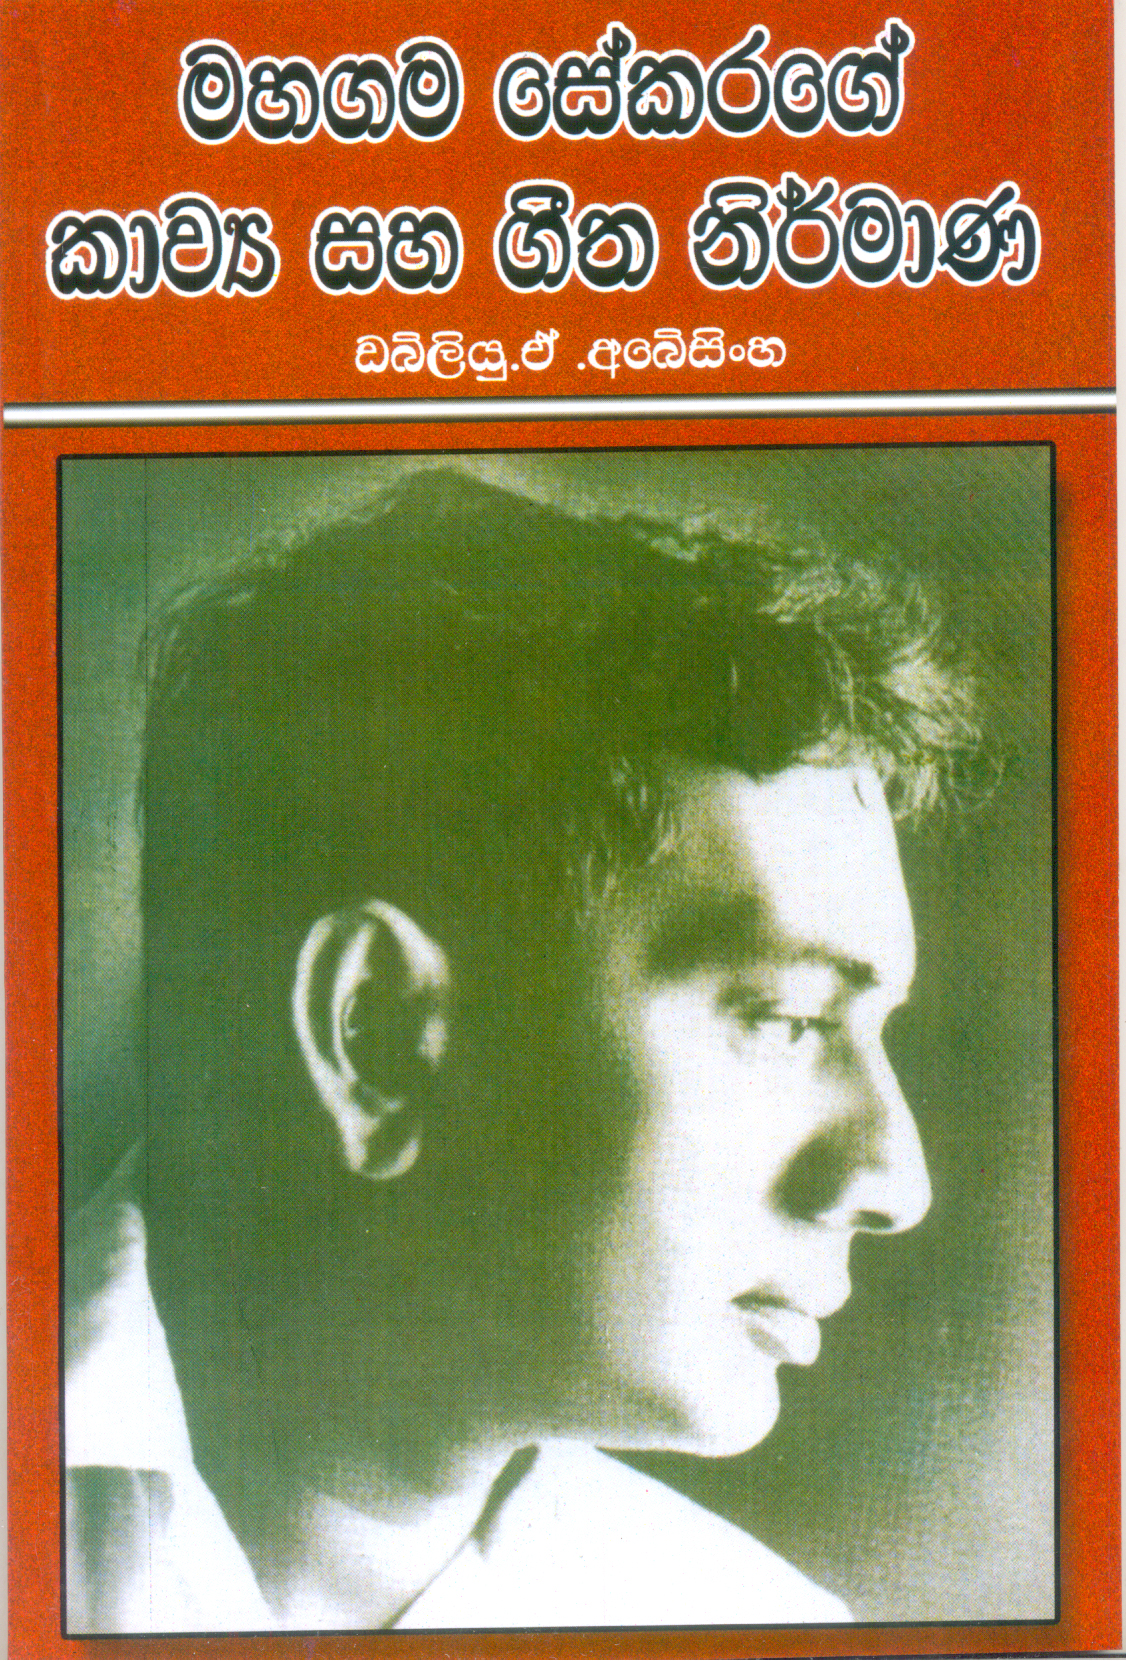 Mahagama Sekarage Kavya Saha Geetha Nirmana